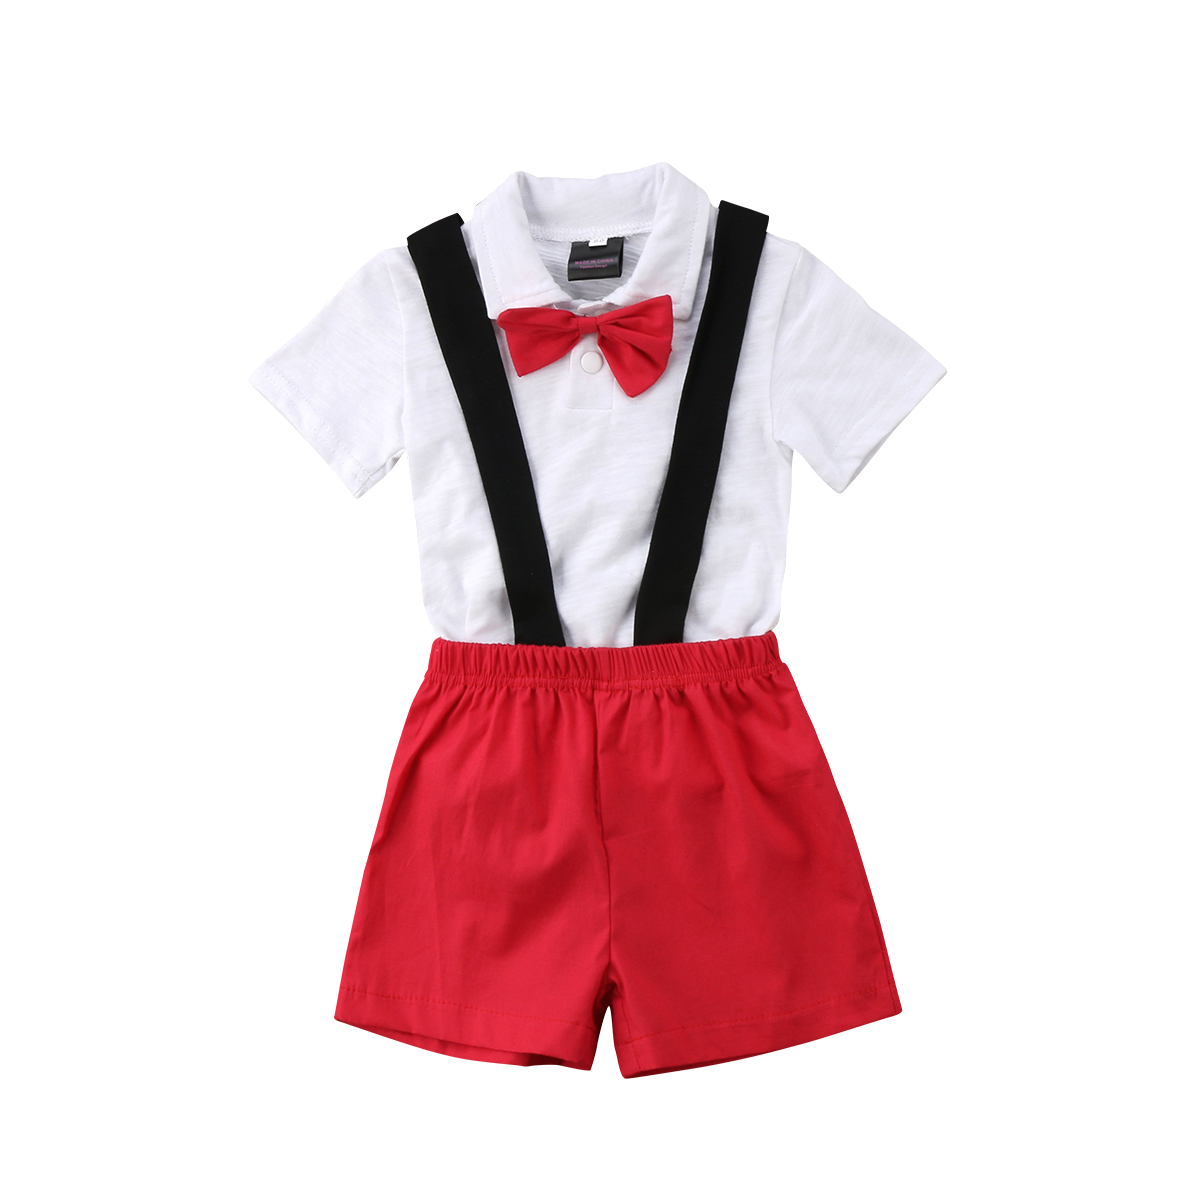 Newborn Infant Baby Boy Kid Gentleman T-shirt Tops+Bib Pants Outfits Clothes Set